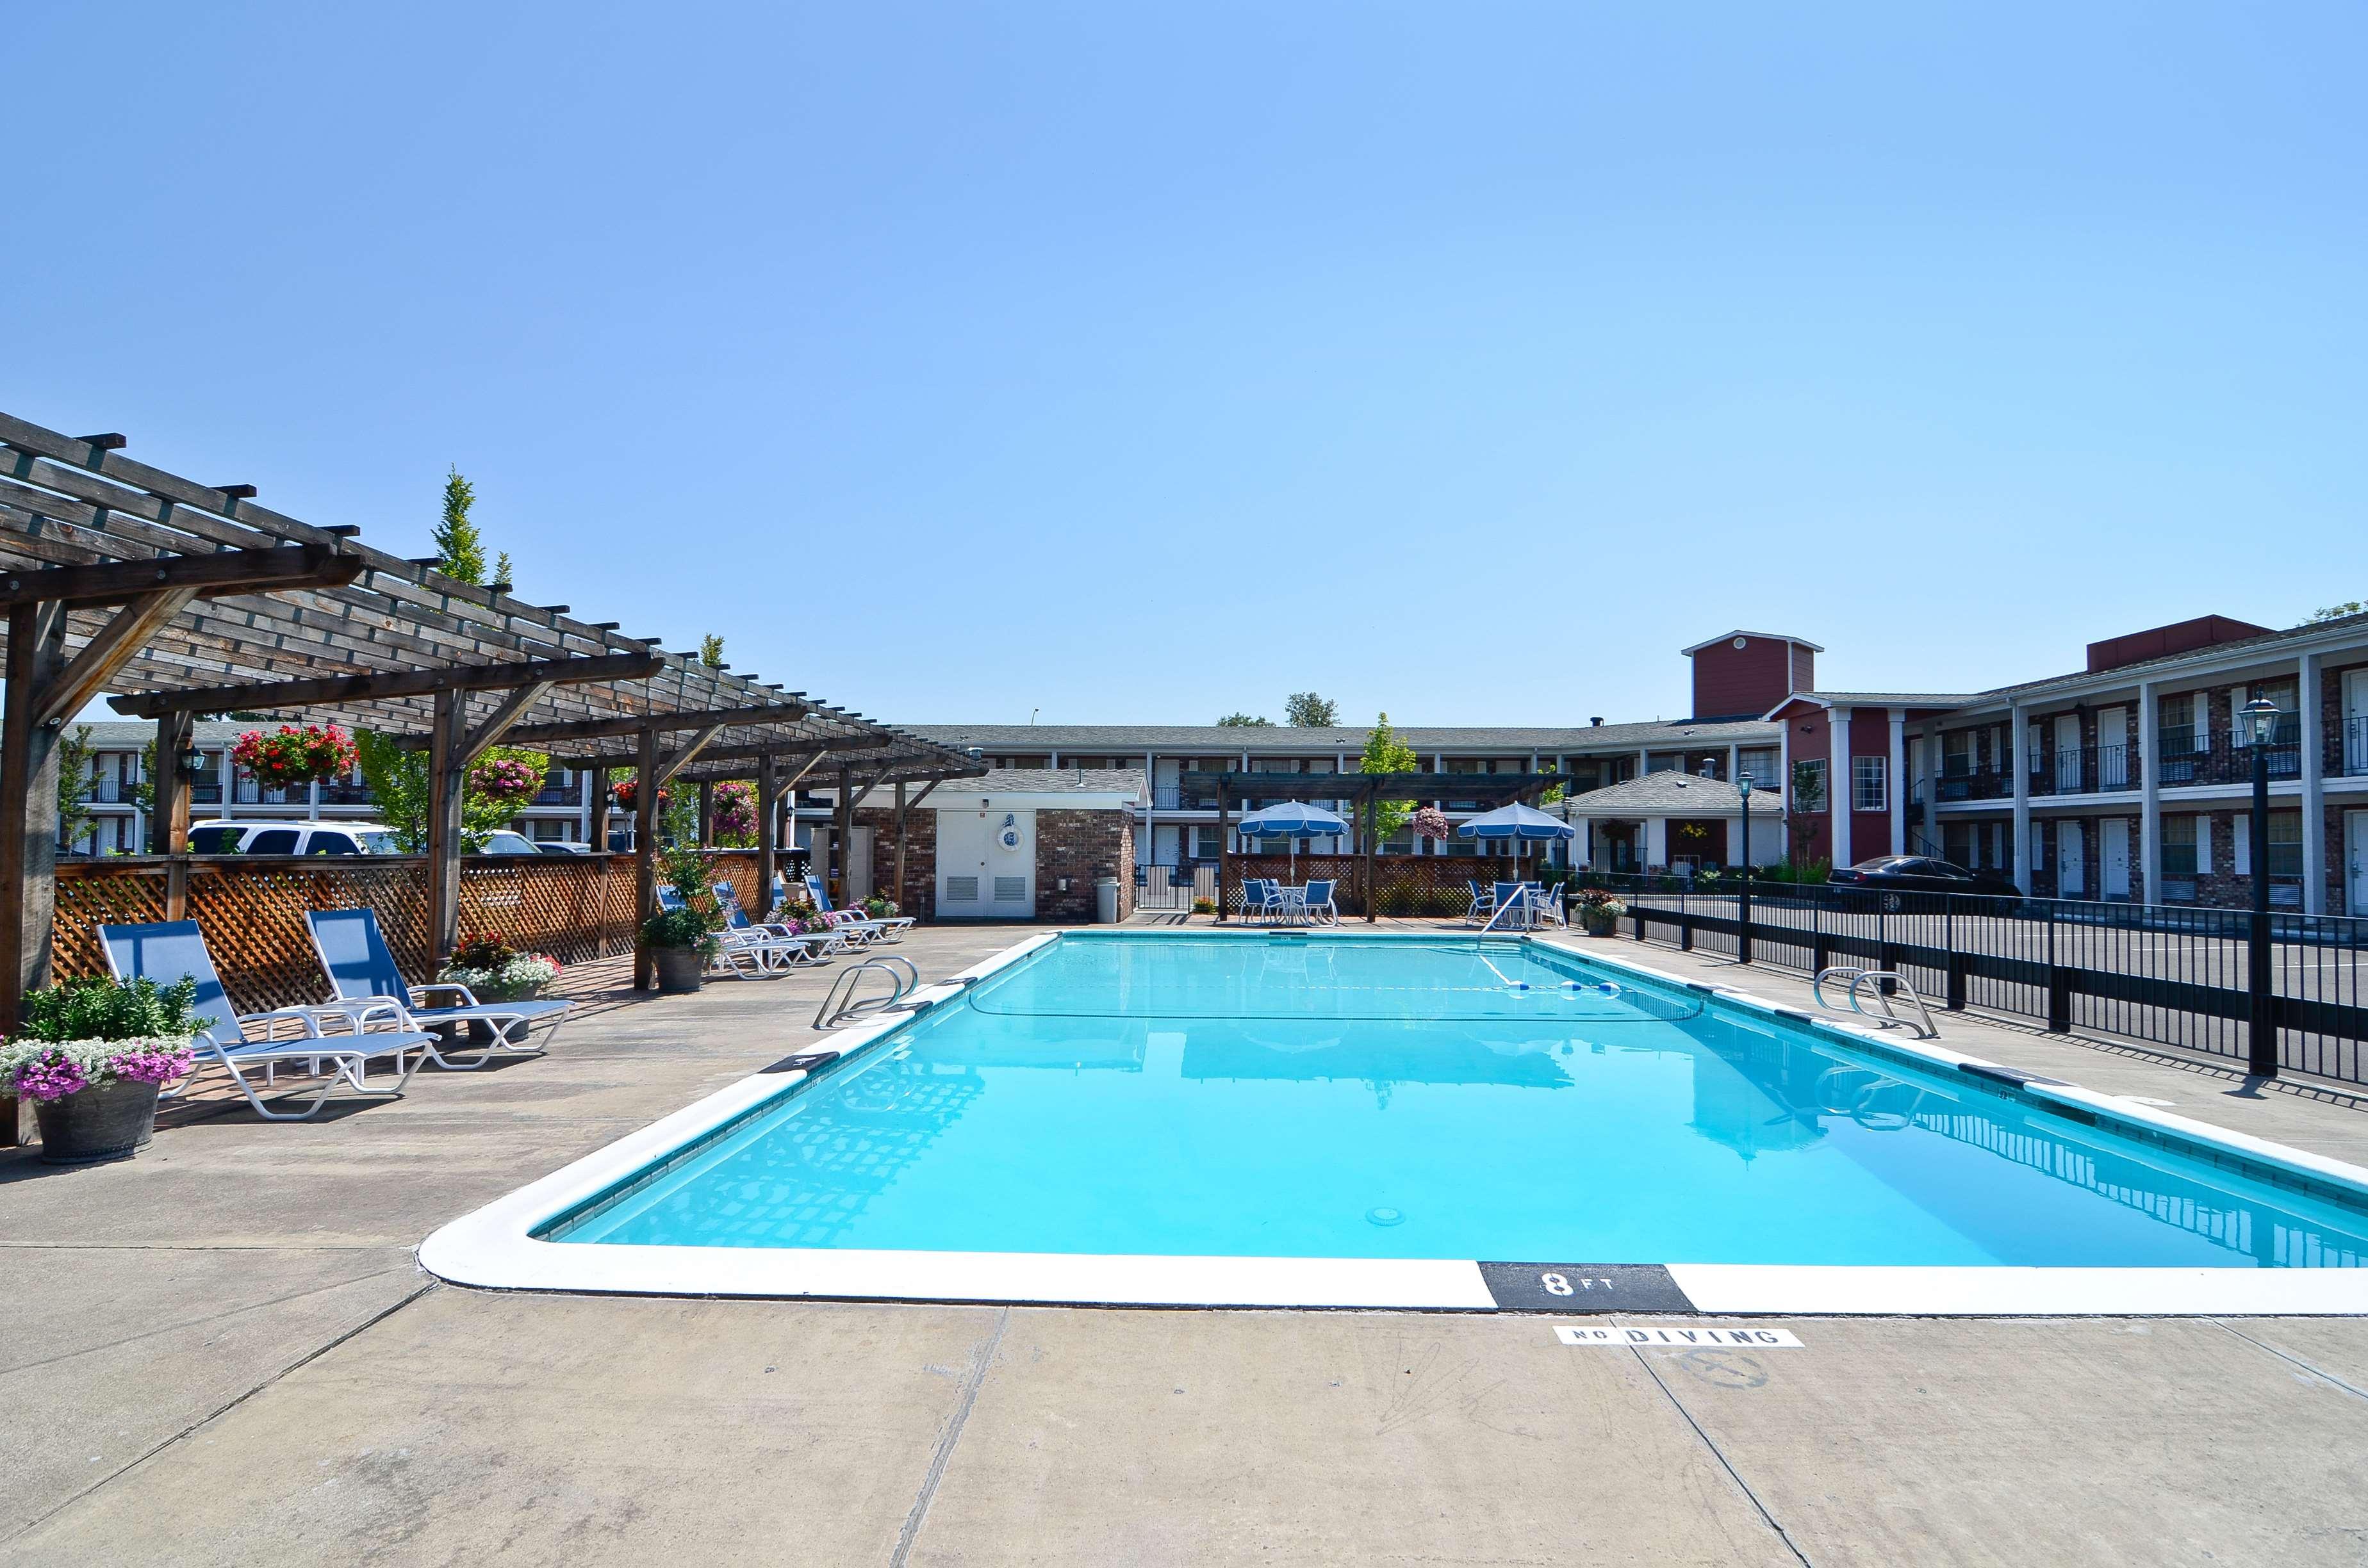 Best Western Horizon Inn Medford Oregon